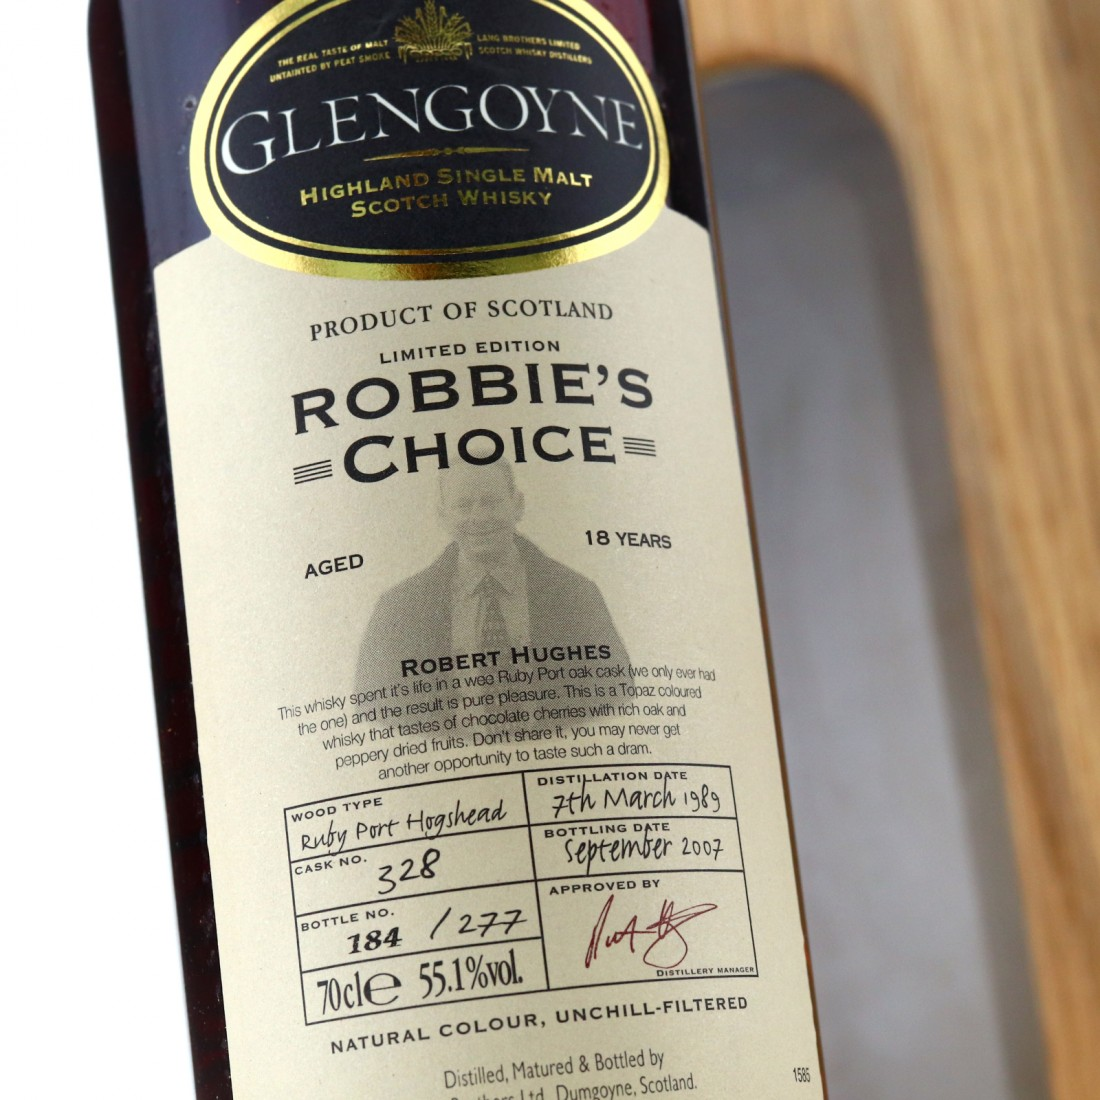 Glengoyne 1989 Robbie's Choice 18 Year Old